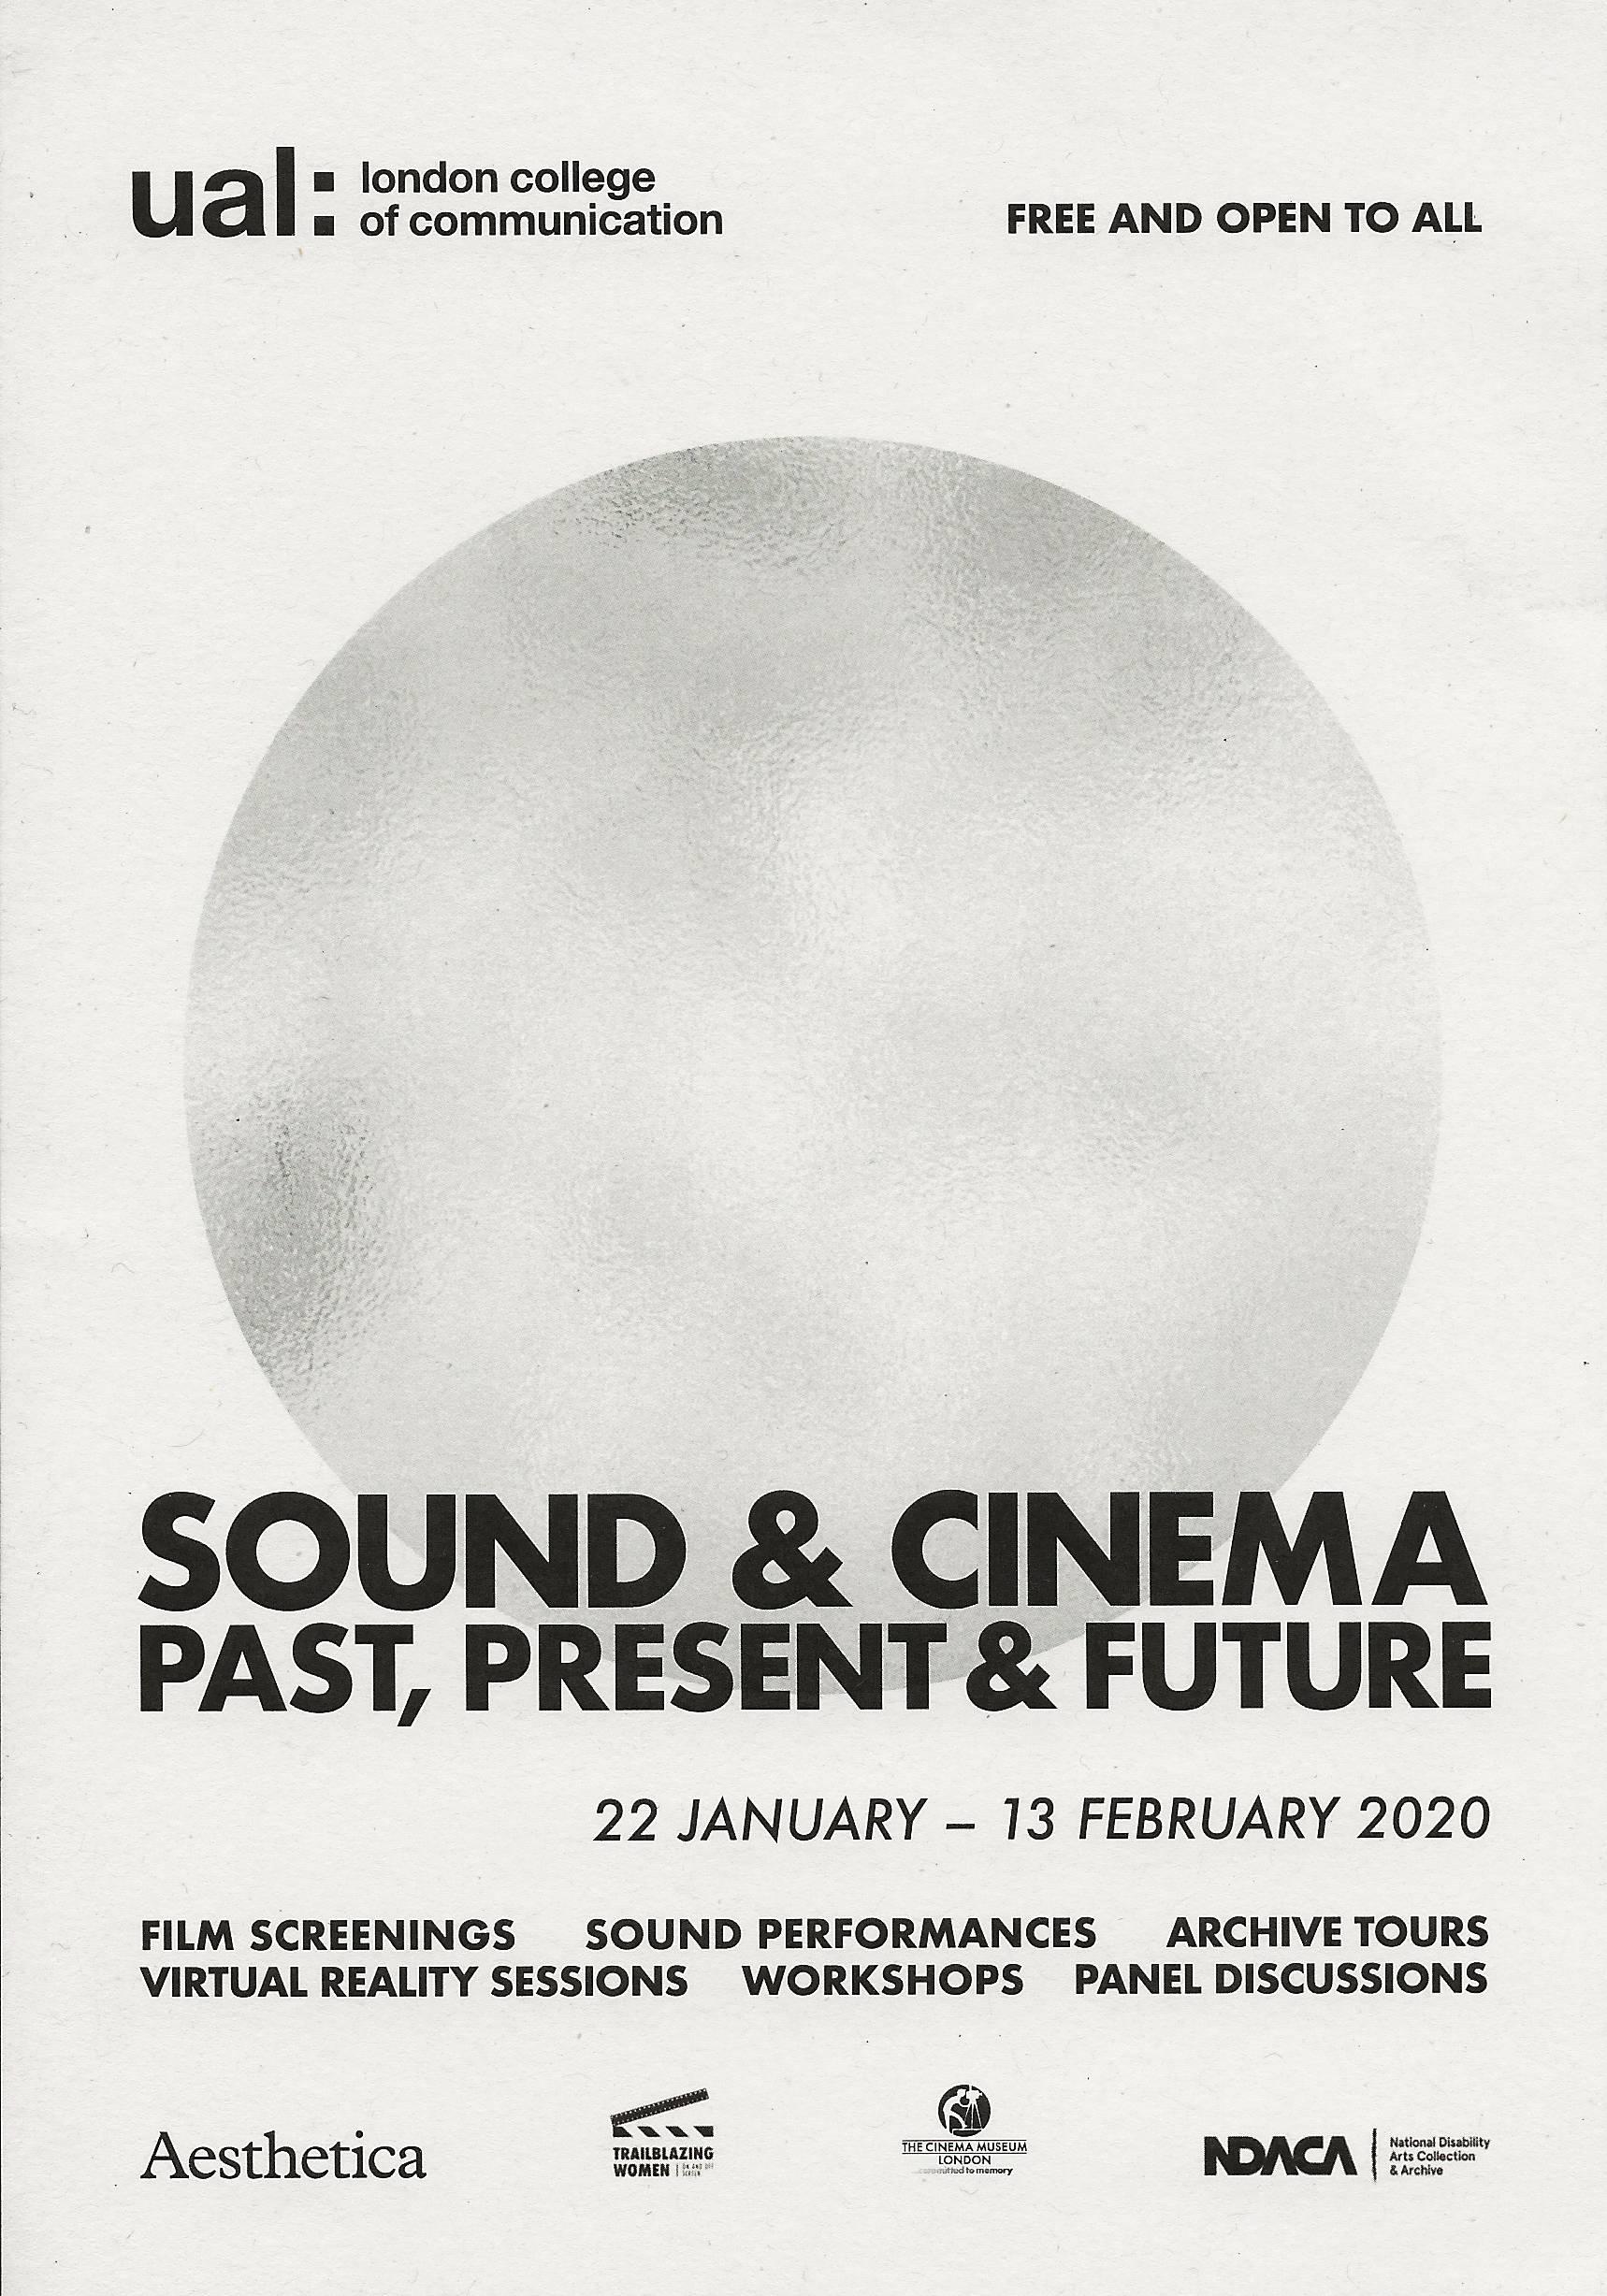 Sound & Cinema: Past, Present & Future (2020)